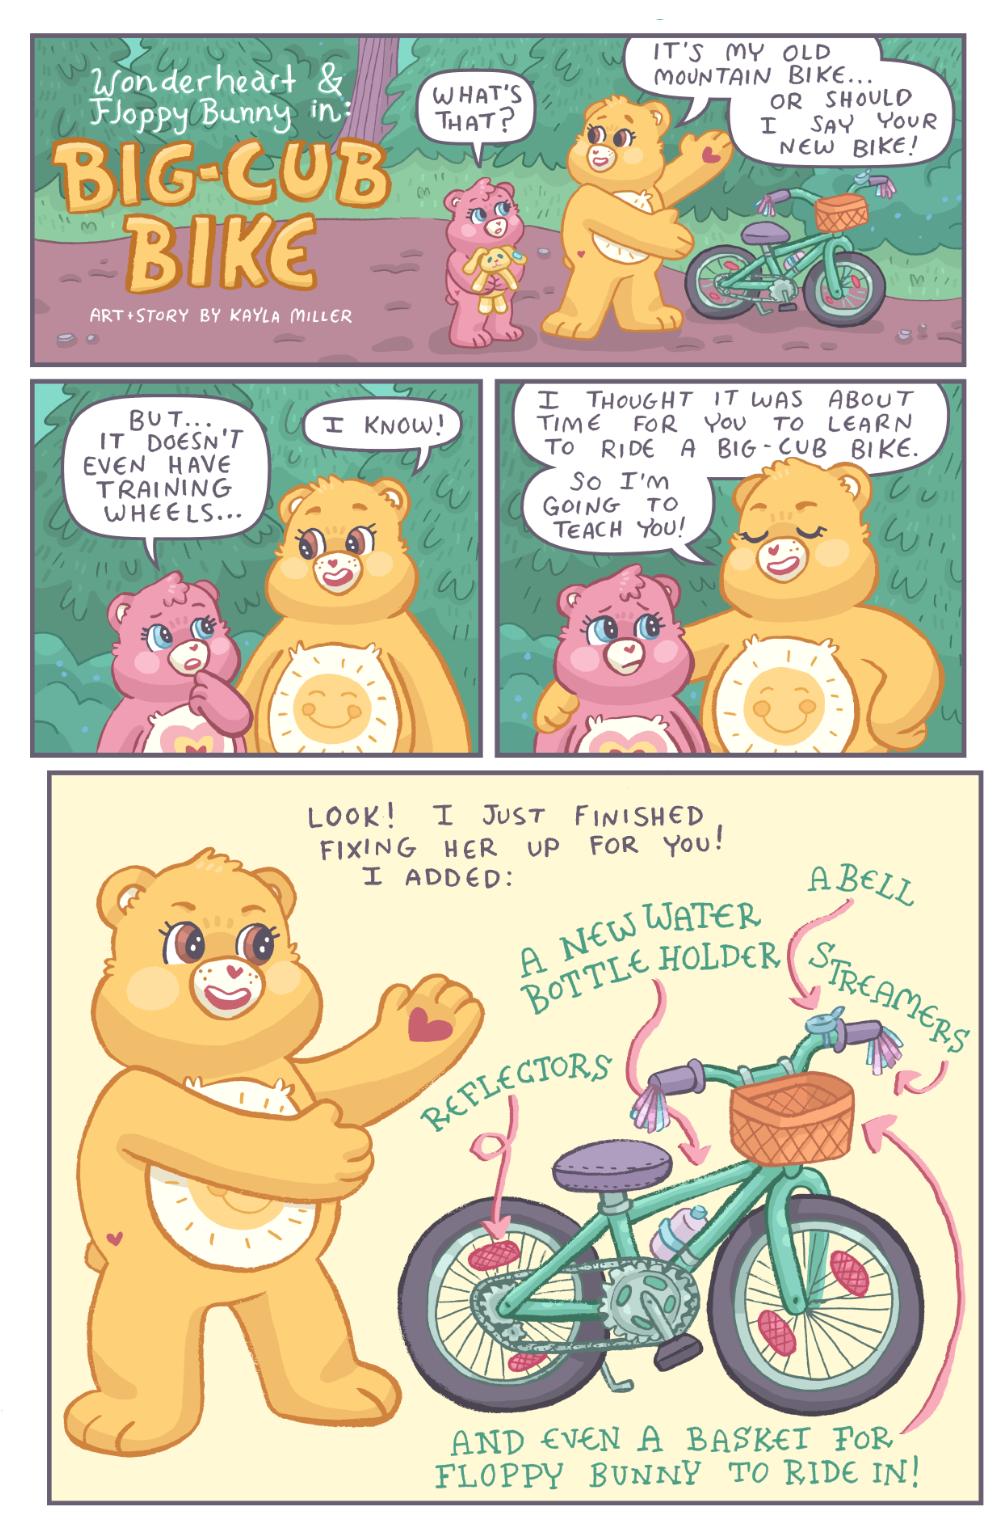 cb-bike-1.png